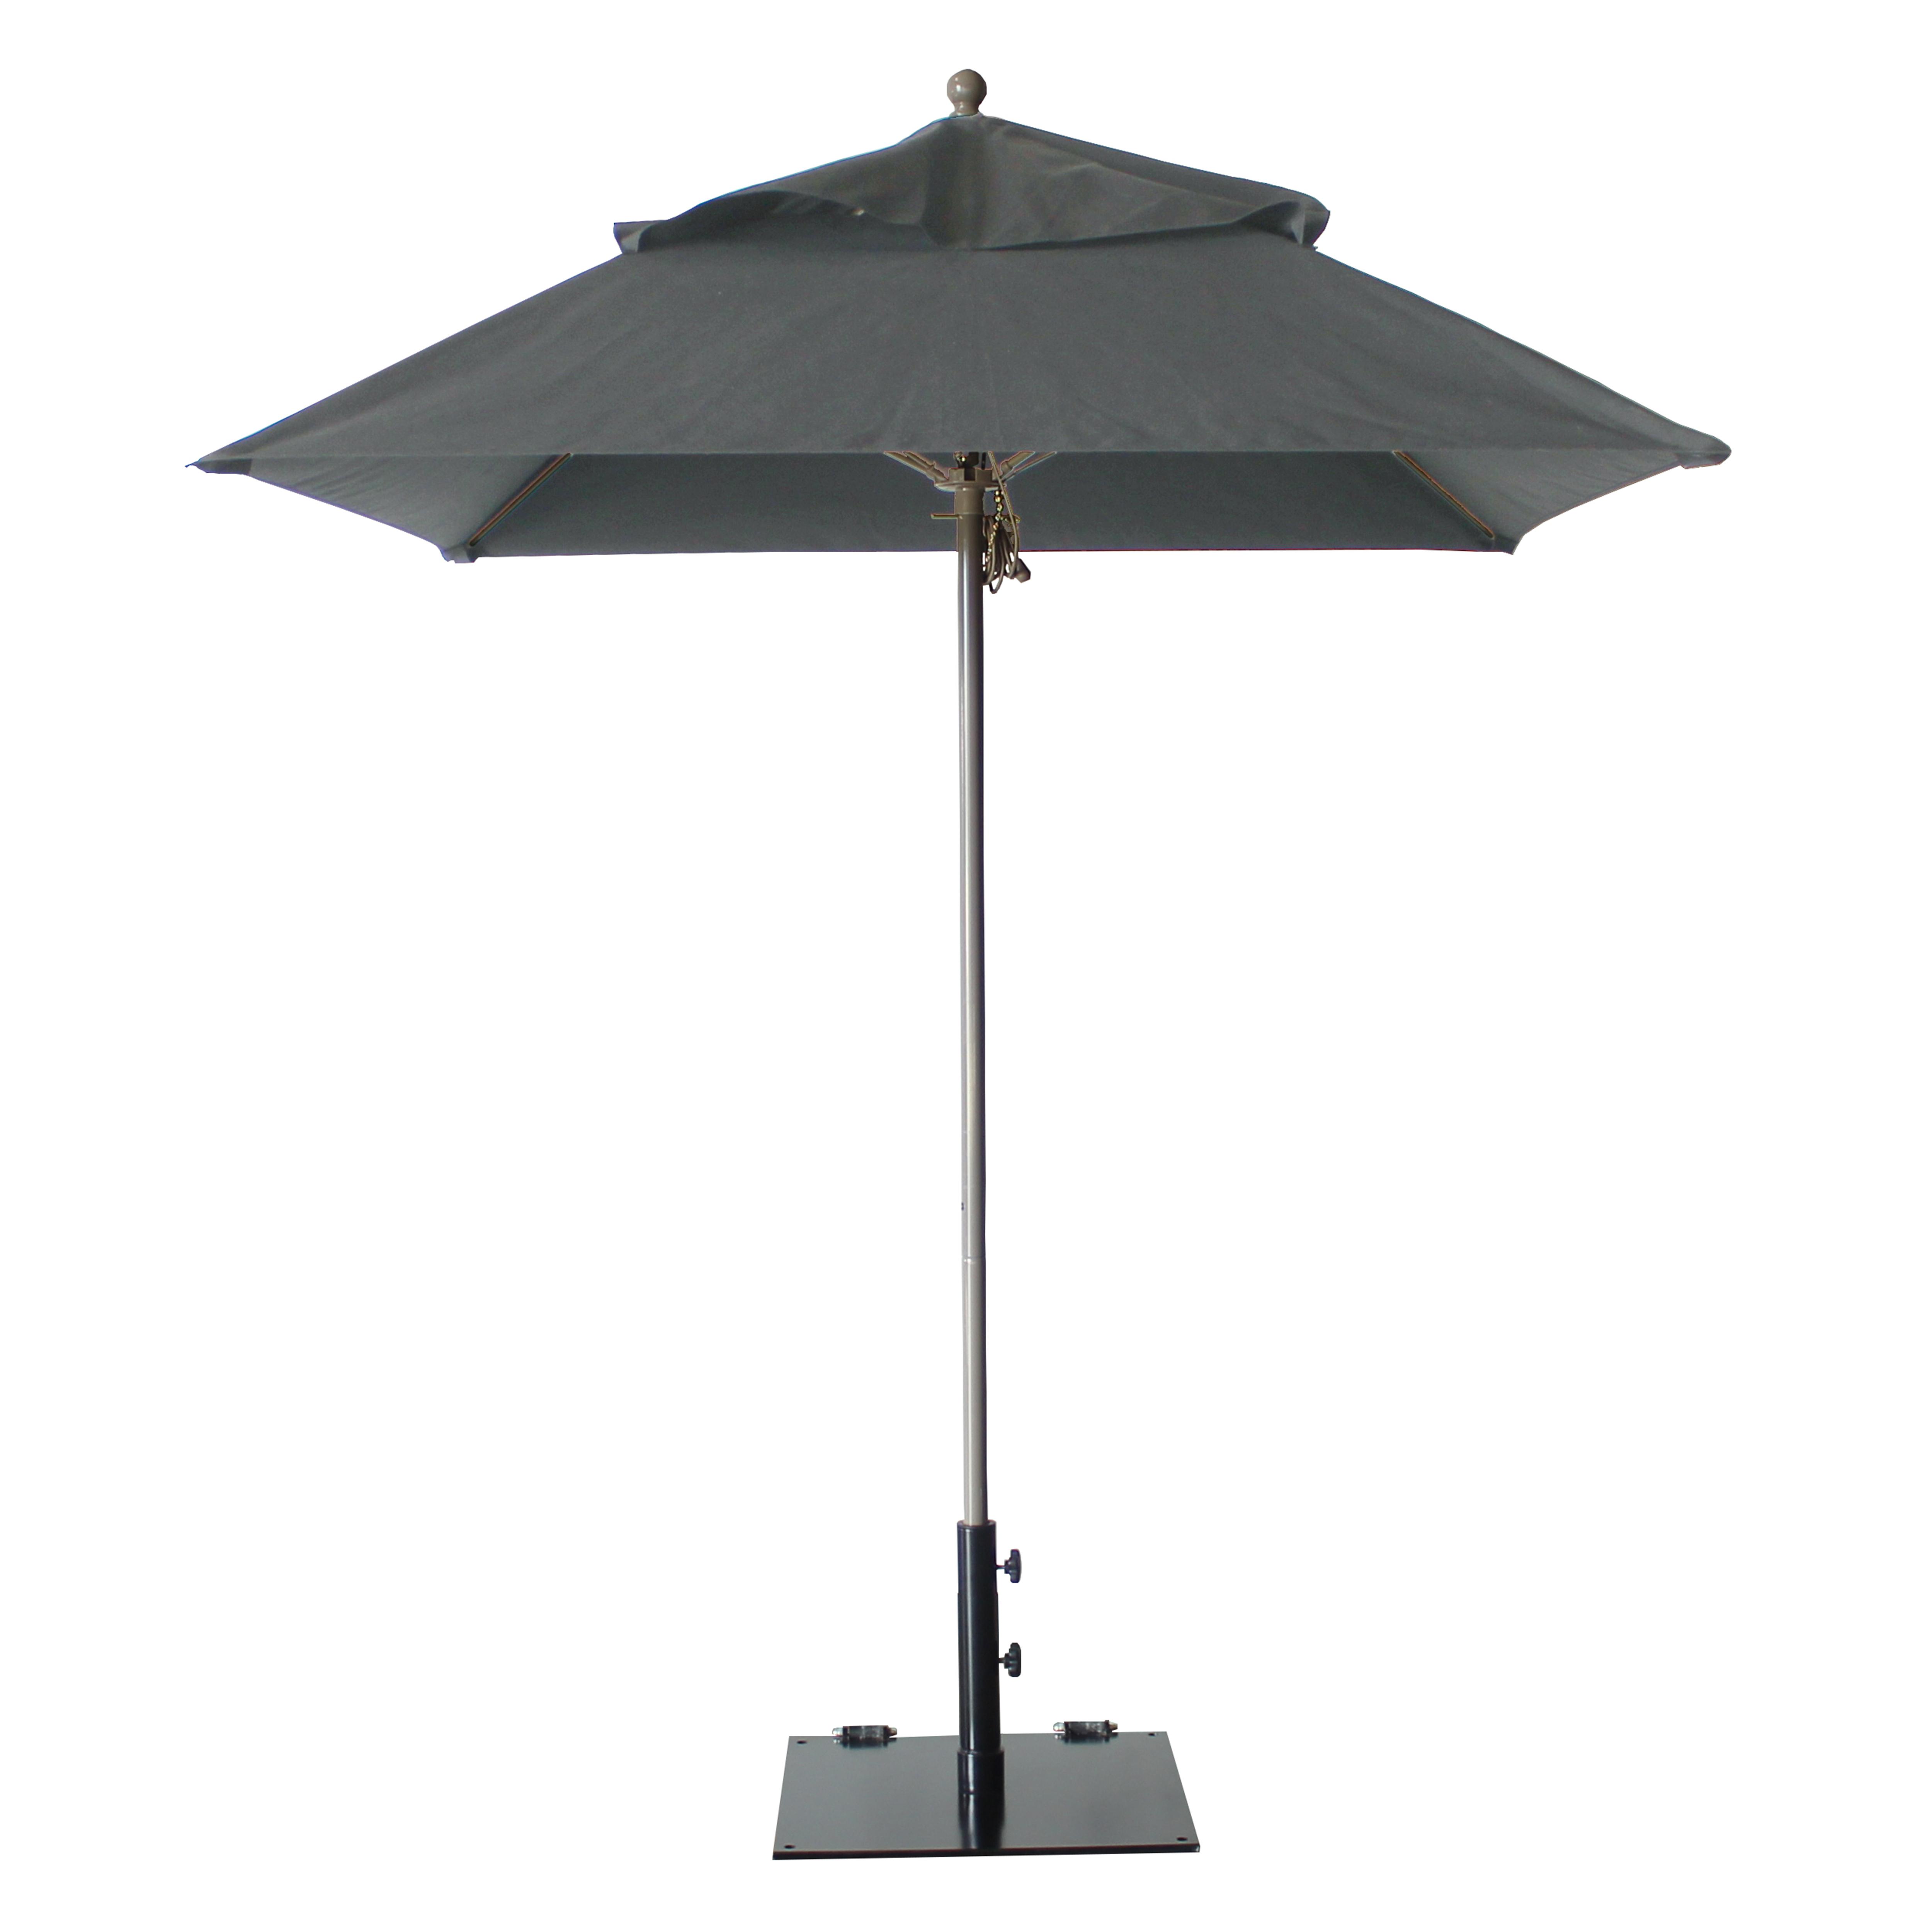 Grosfillex 98660231 umbrella